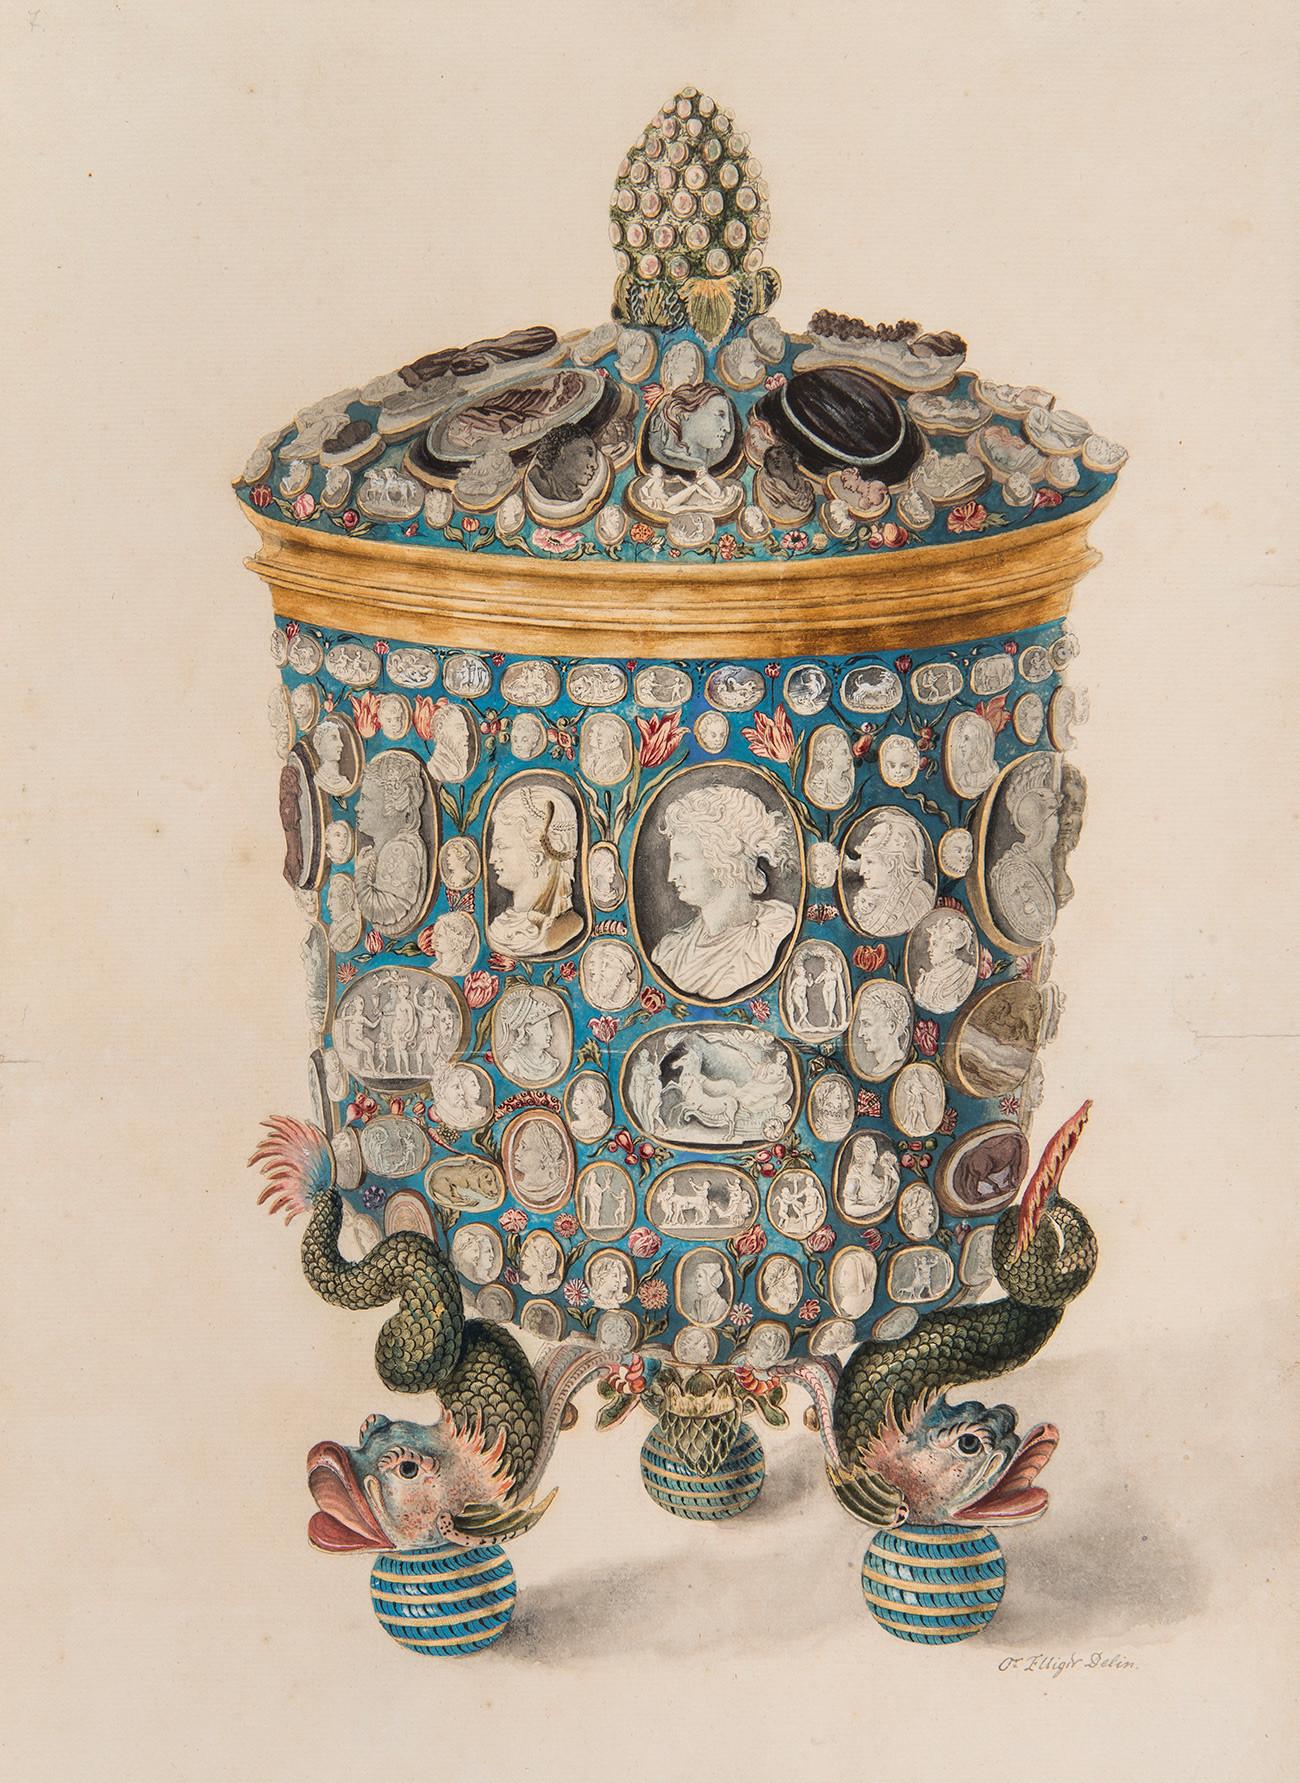 OTTMAR ELLIGER: PEHAR S POKLOPCEM UKRAŠEN DRAGULJIMA. Akvarel. Rusija, oko 1730. Papir, četkica, pero, pozlata, mastilo, vodene boje.